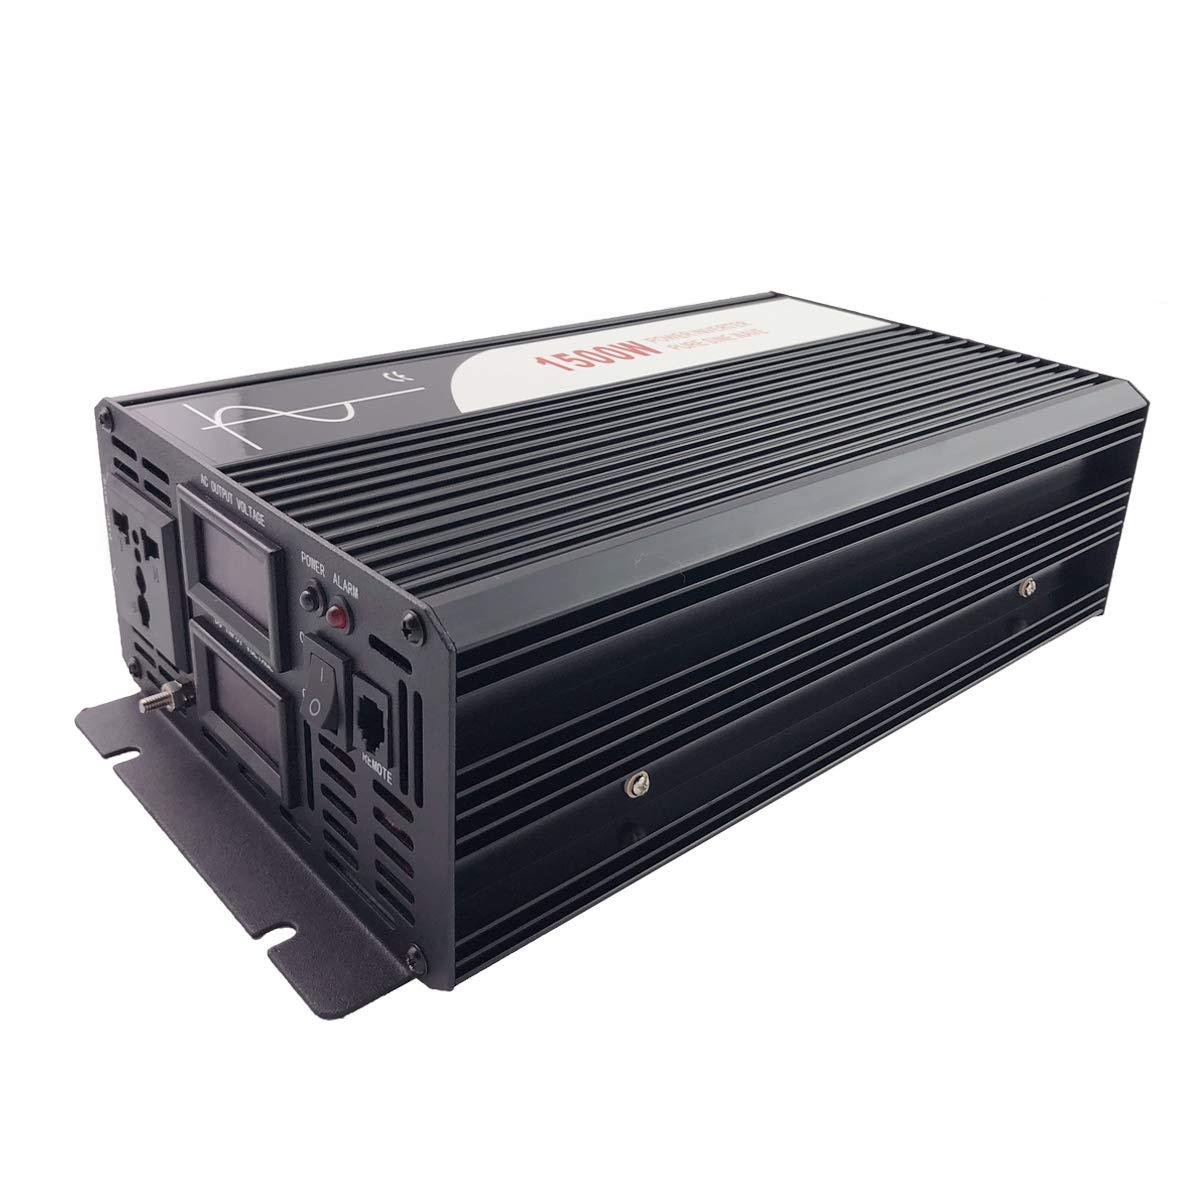 DC 12V to AC 120V Peak 3000W Pure Sine Wave power Inverter DC 12V 24V 48V to AC 120V 60HZ Solar converter For Home Use car Xijia 1500W